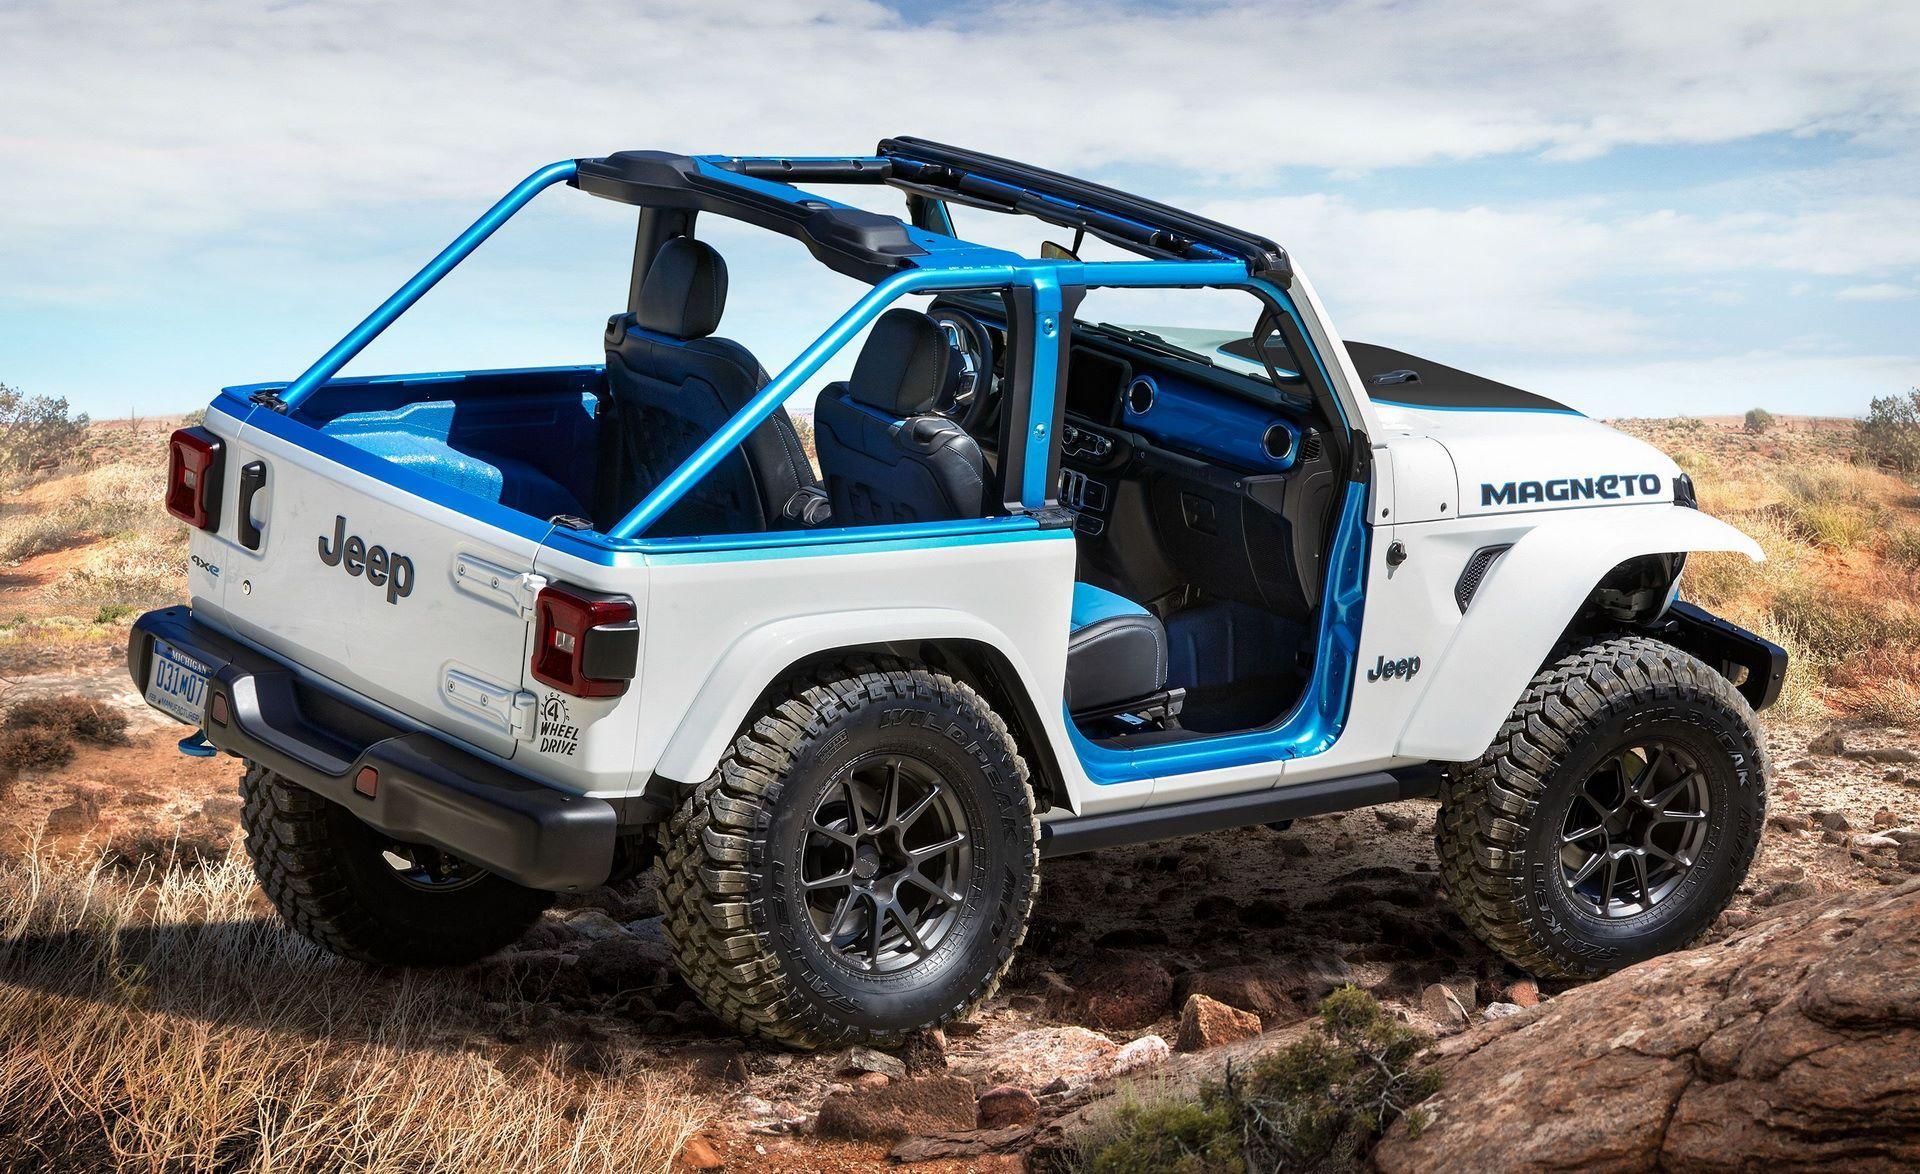 2020-jeep-wrangler-magneto-electric-concept-2